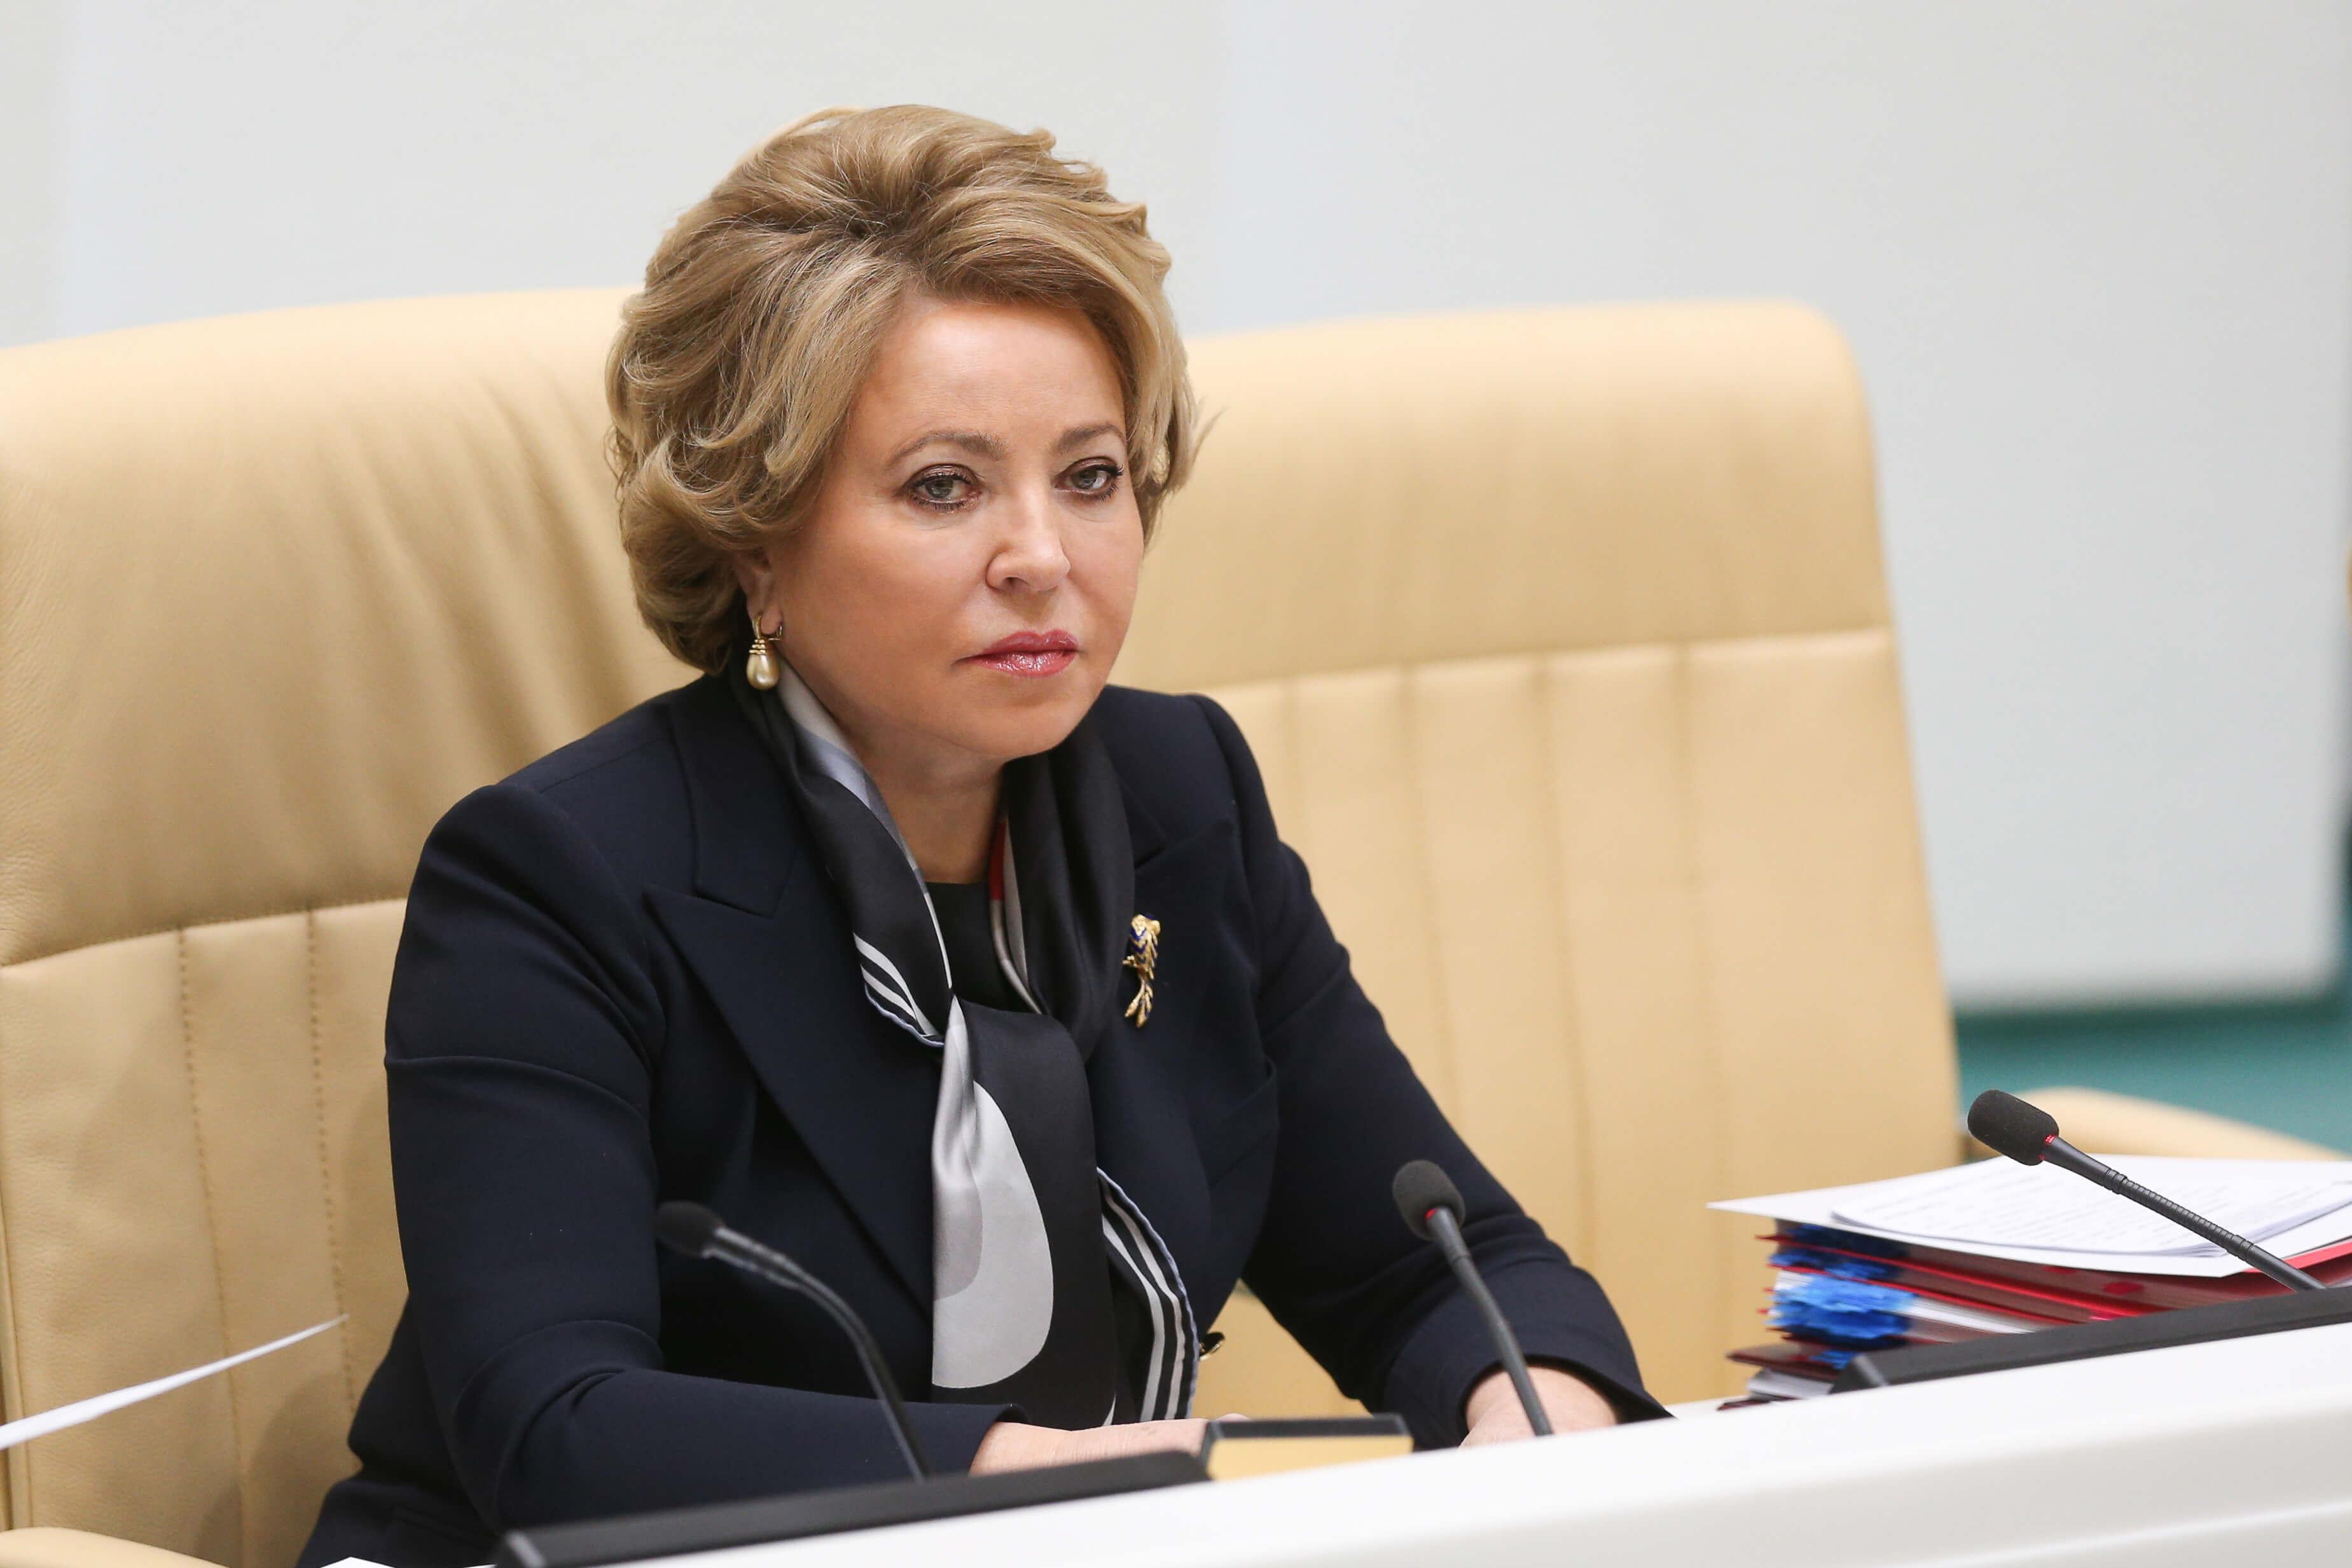 Federation Council of Russia/via Globallookpress.com